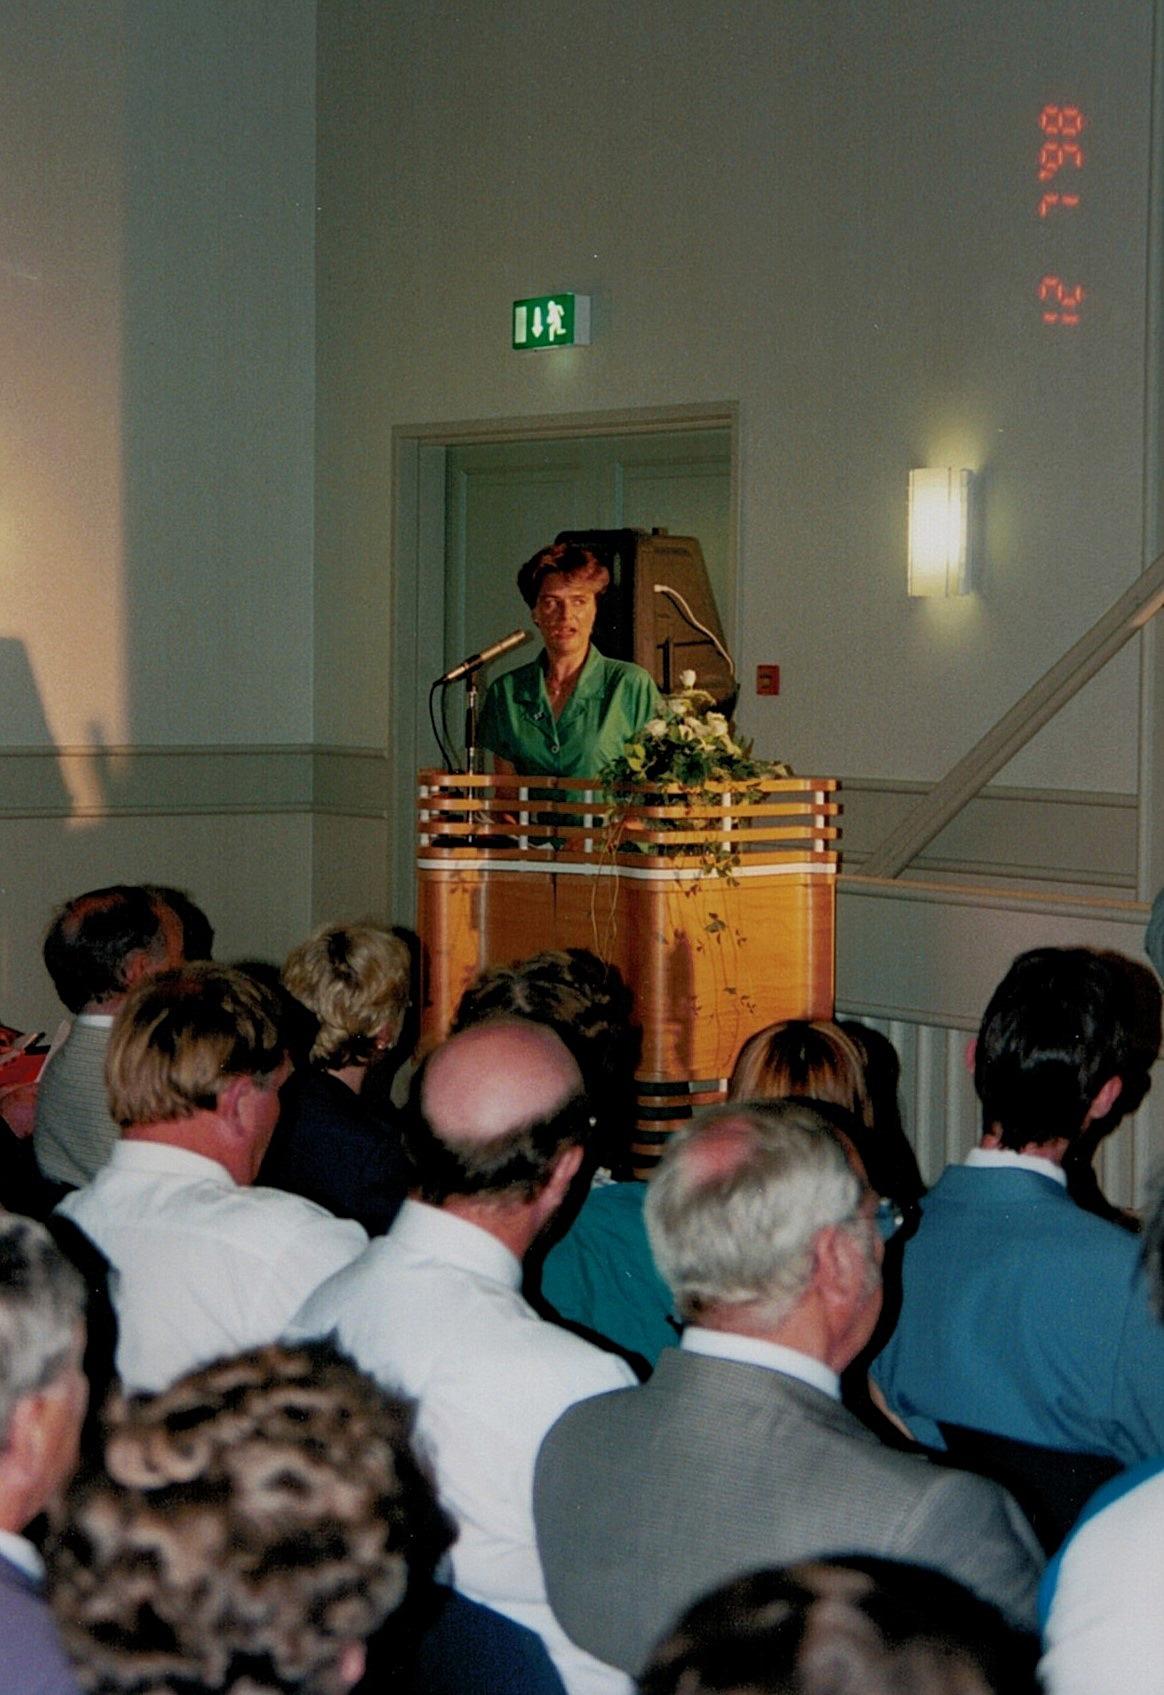 Festtalare var EU-parlamentarikern Astrid Thors.